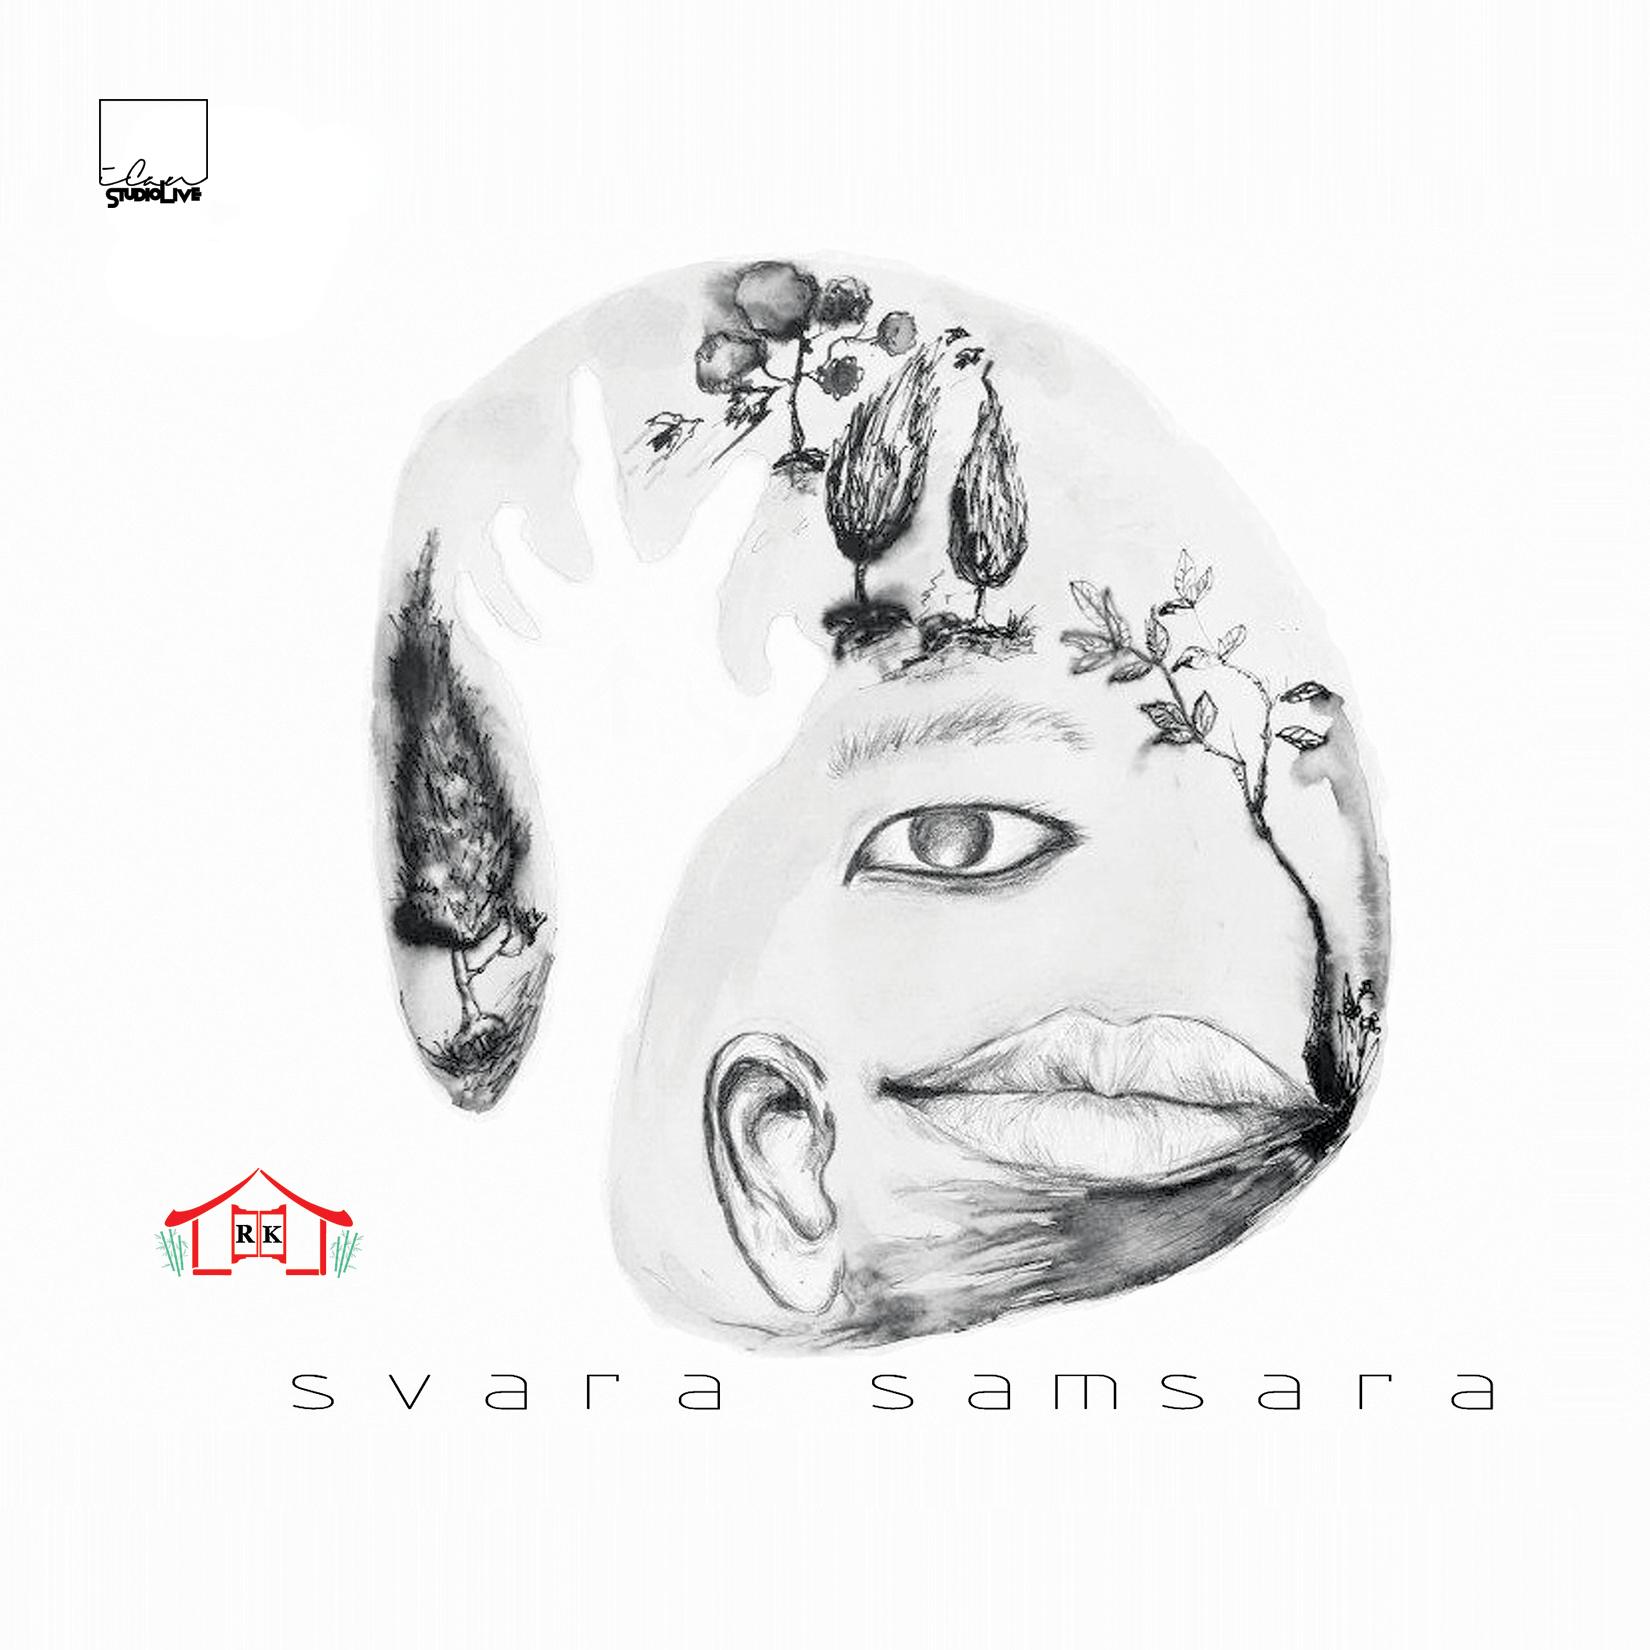 SVARA SAMSARA - Svara SamsaraMusic Works Release Concert // MWRCTuesday, 2 February 20164pm - 6pmby iCSL℗2016 iLuwi Production